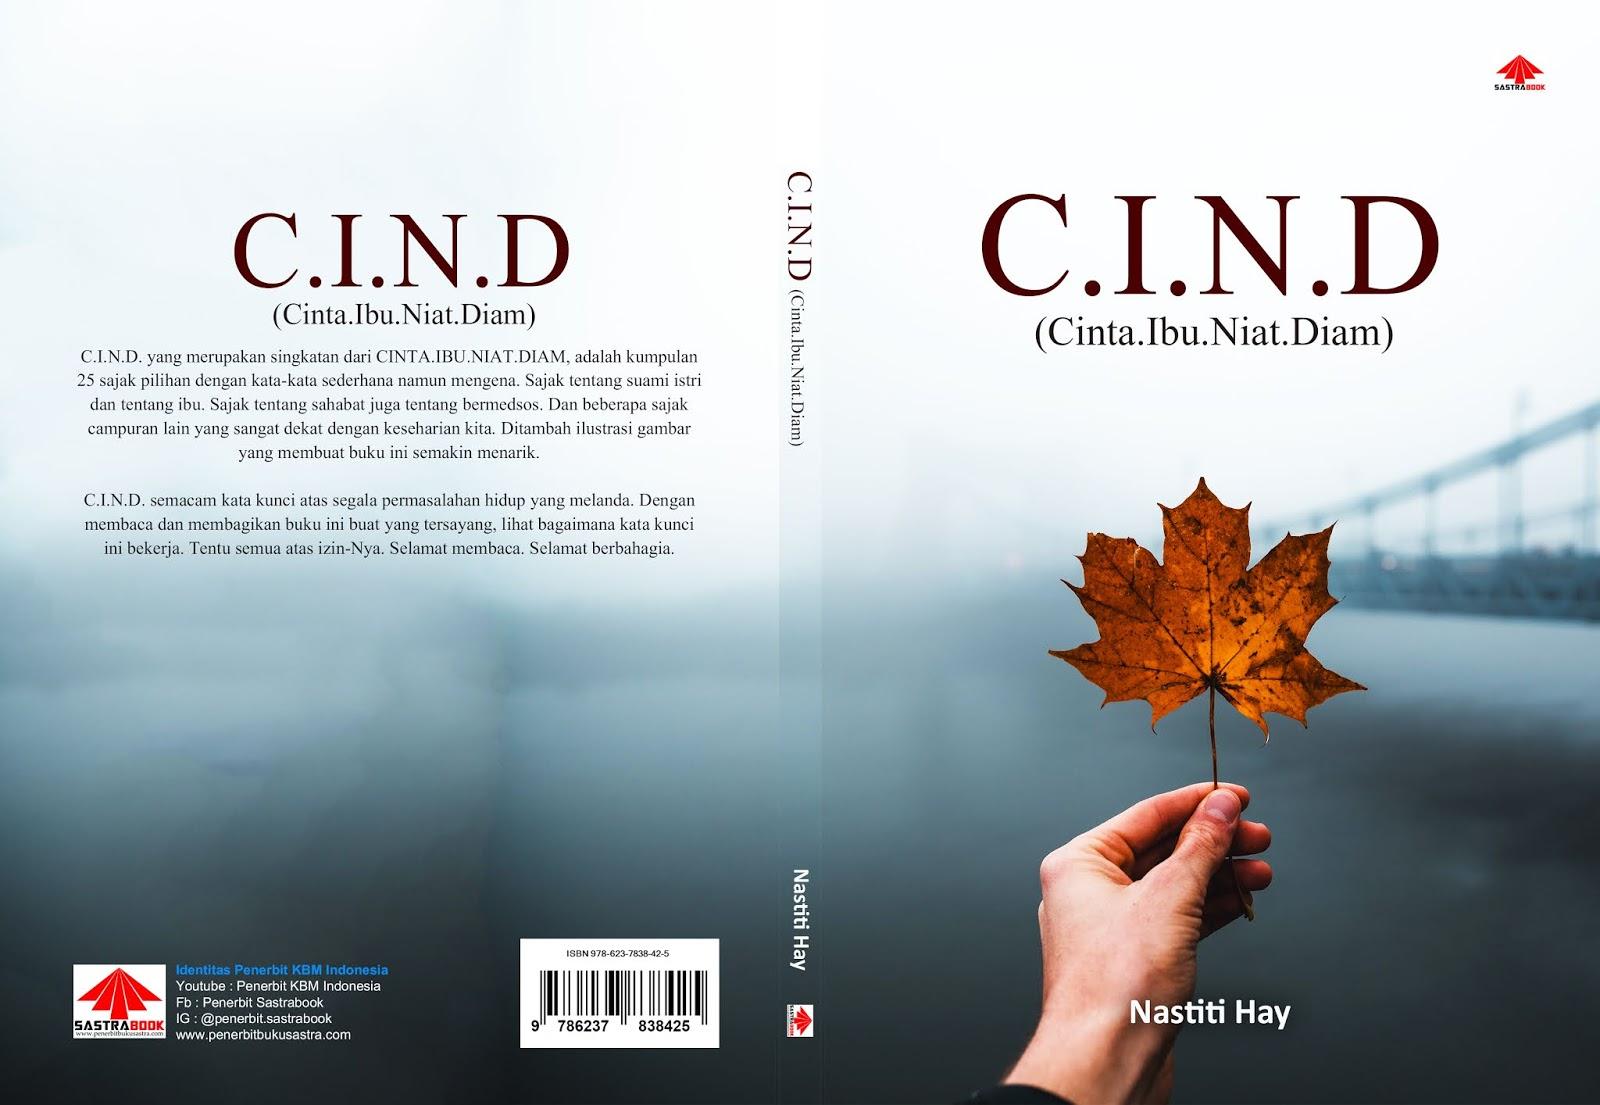 C.I.N.D (Cinta.Ibu.Niat.Diam)